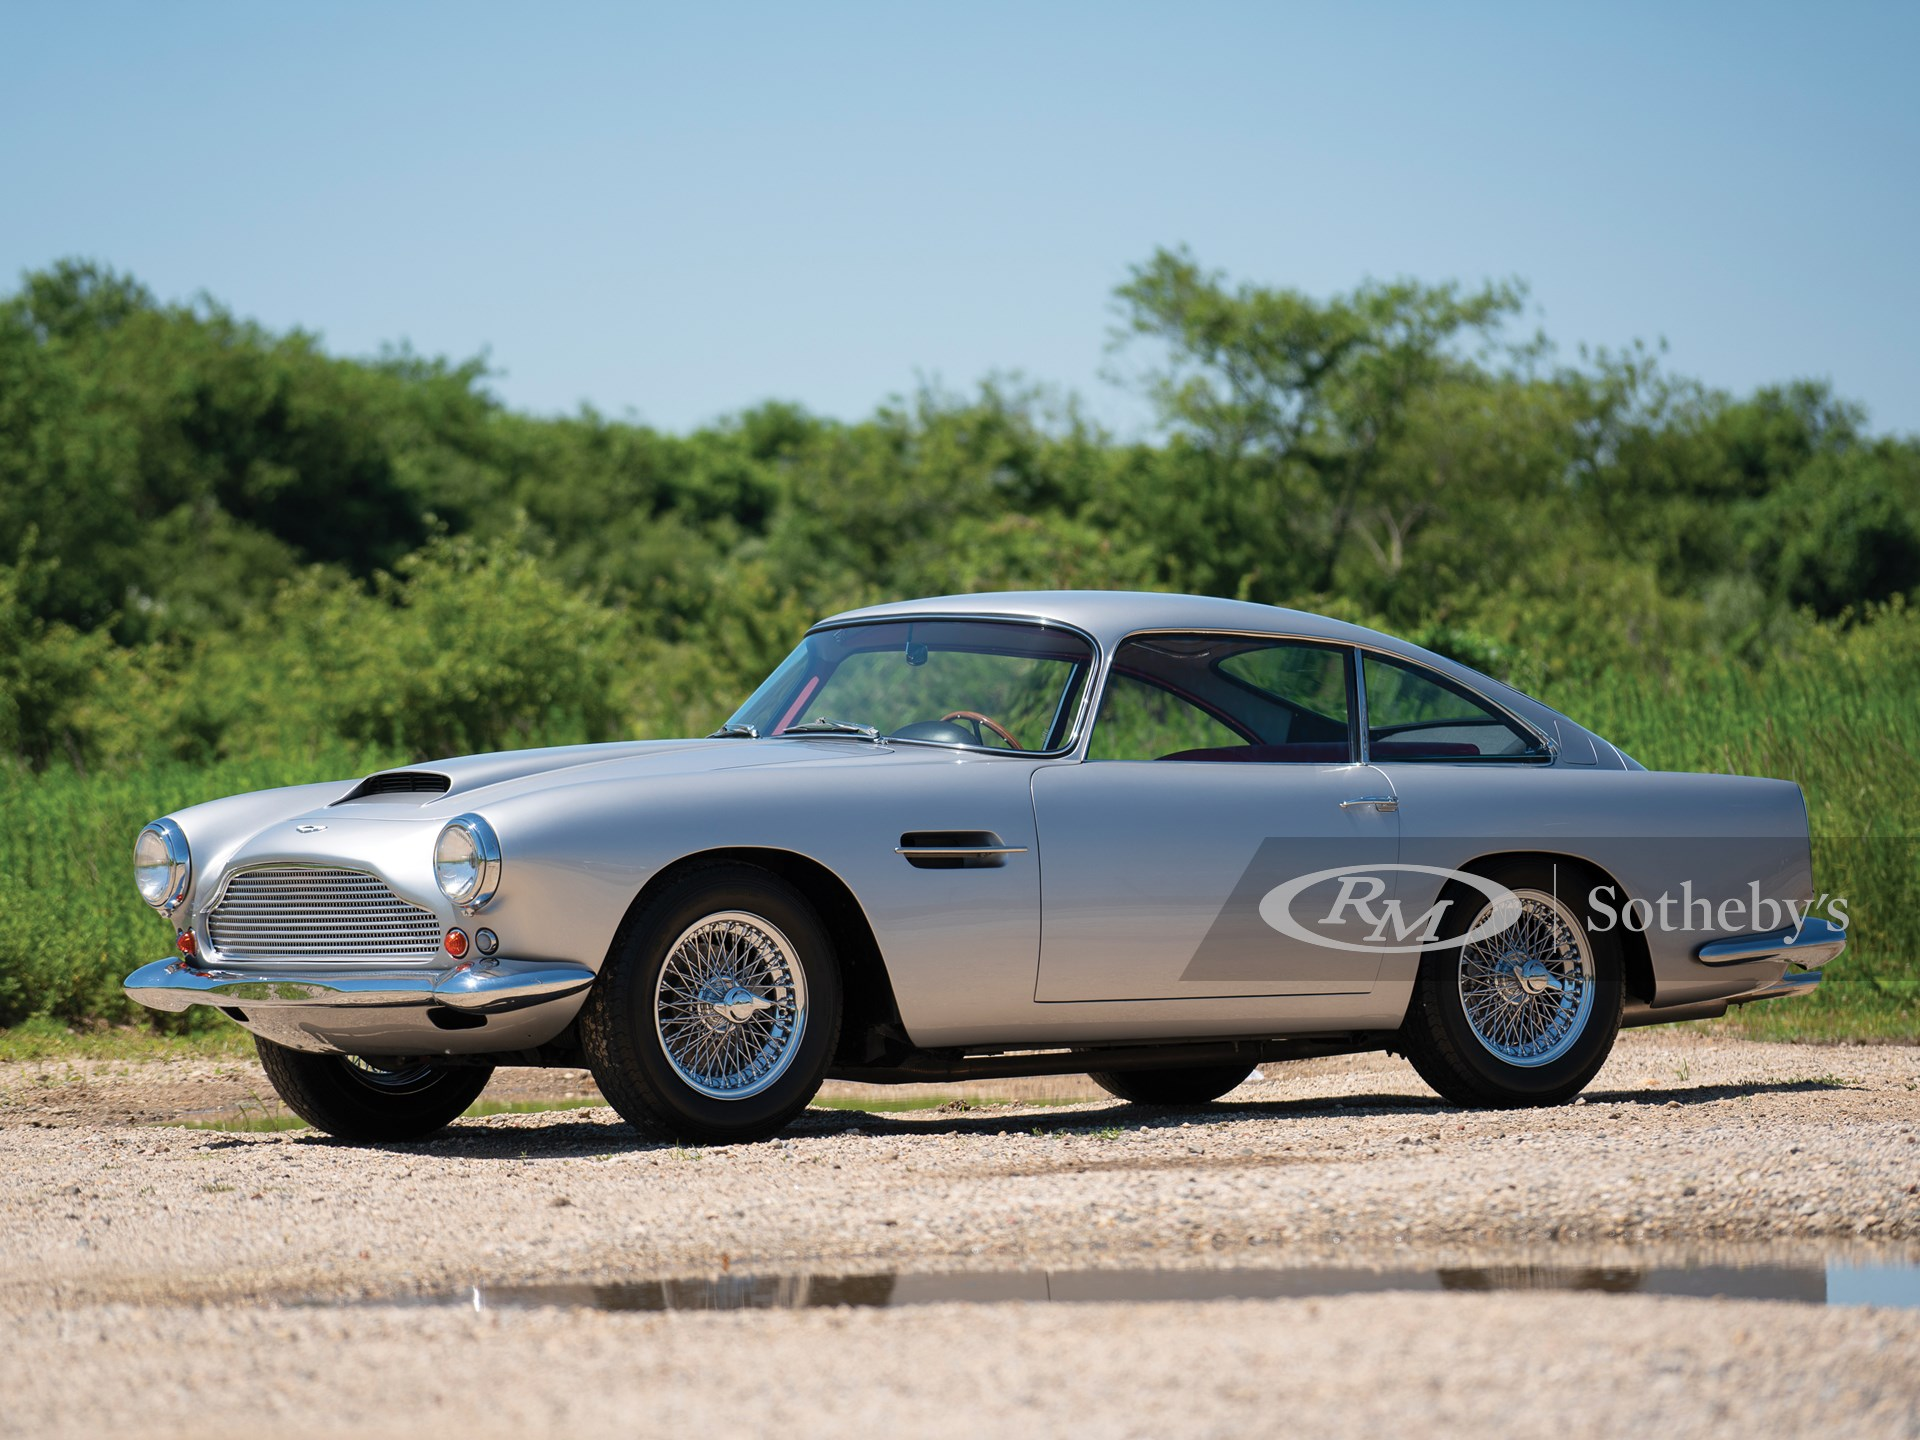 1960 Aston Martin Db4 Series I Monterey 2019 Rm Sotheby S